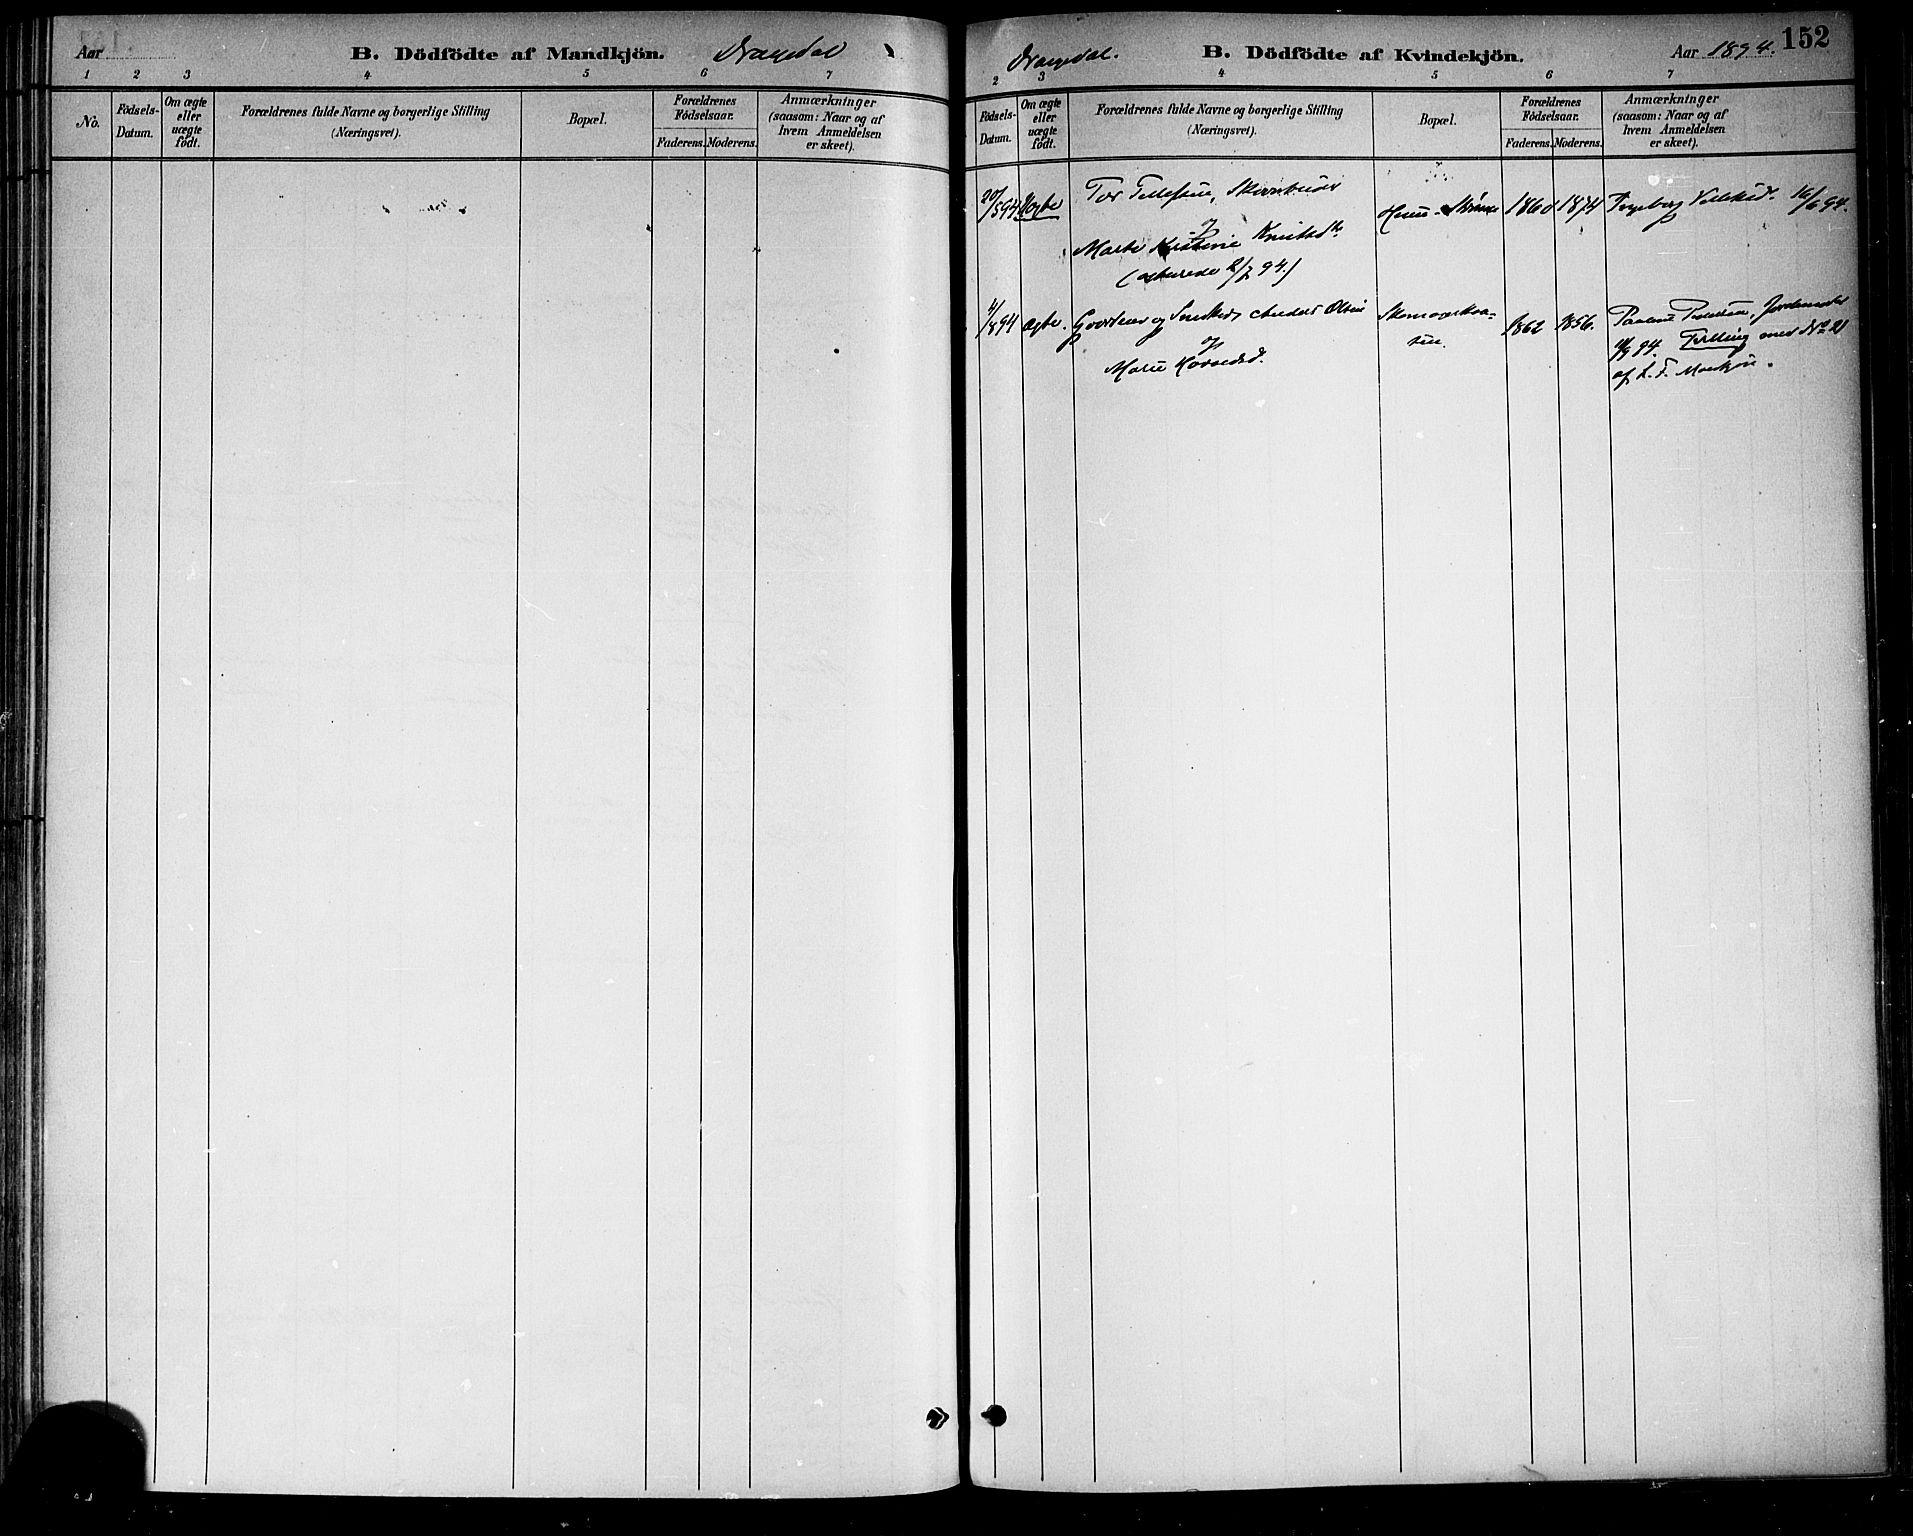 SAKO, Drangedal kirkebøker, F/Fa/L0010: Ministerialbok nr. 10 /1, 1885-1894, s. 152